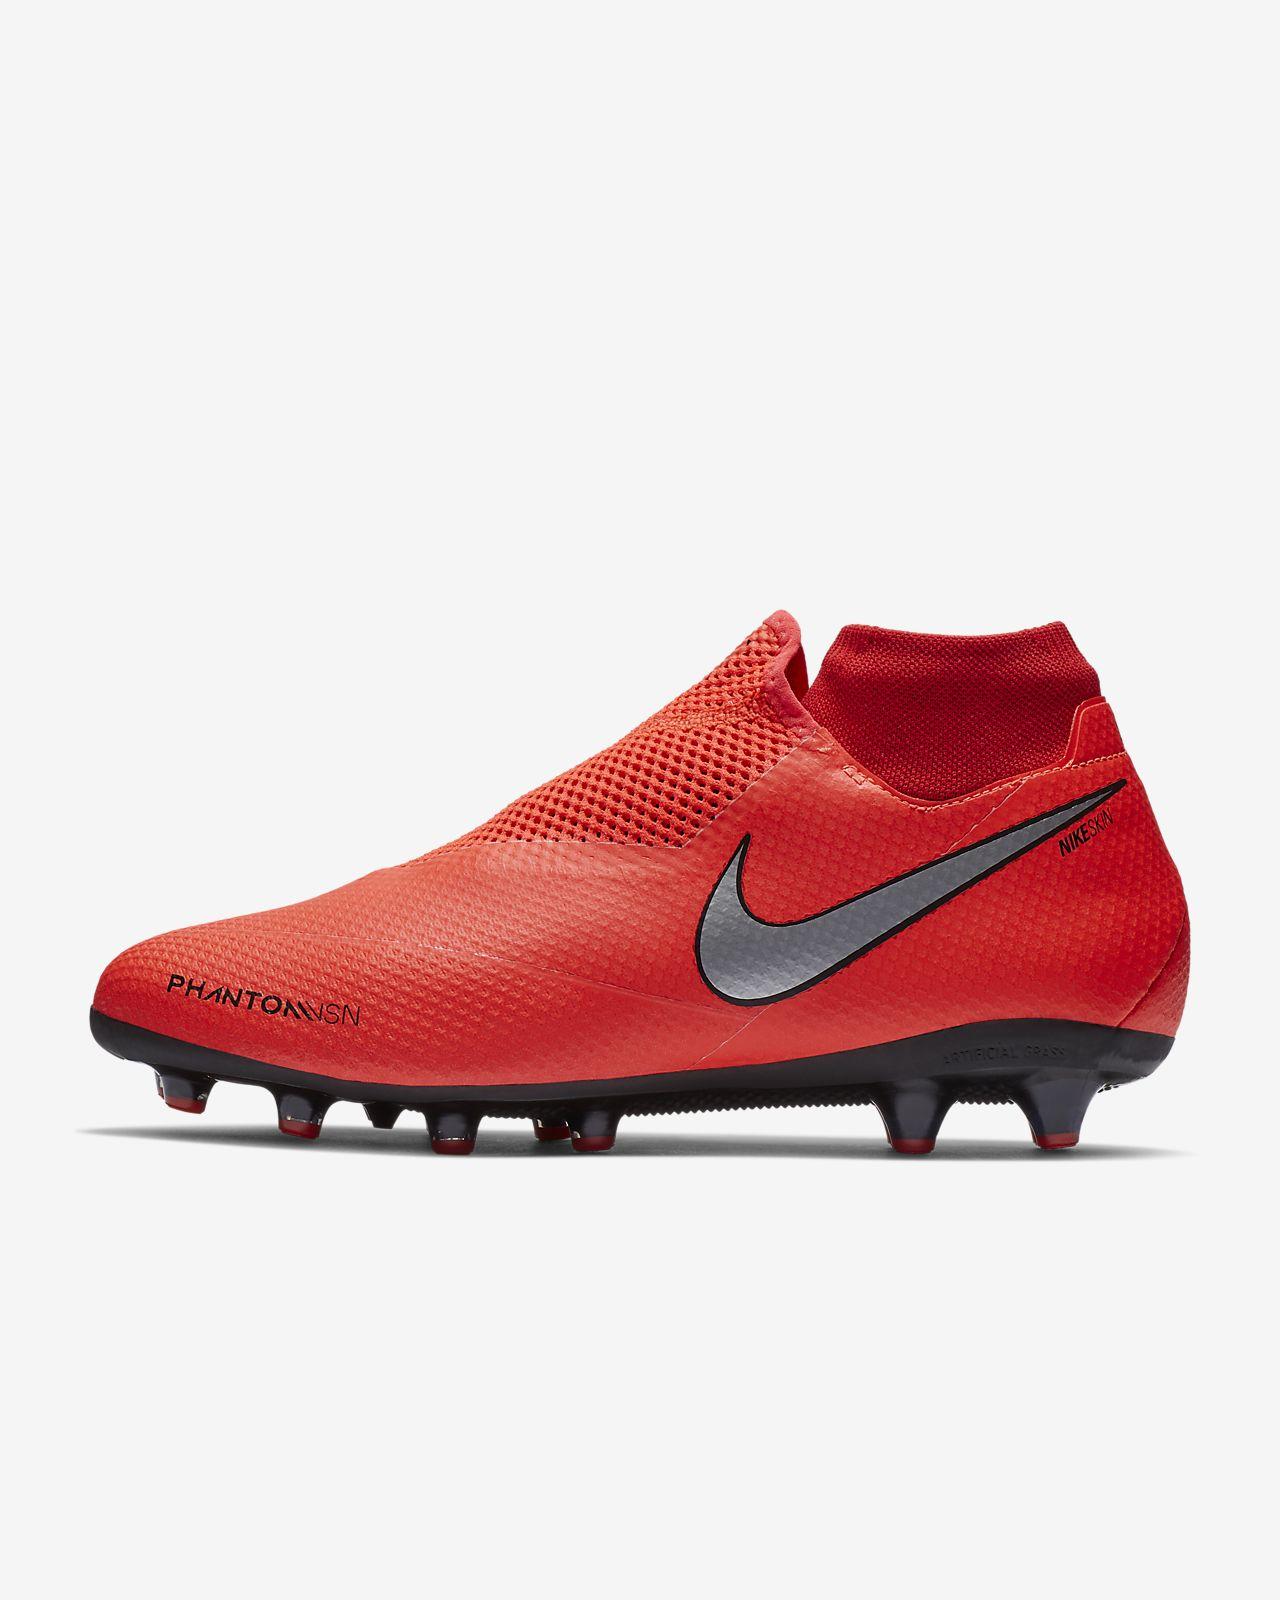 26c616c2143827 ... Scarpa da calcio per erba artificiale Nike Phantom Vision Pro Dynamic  Fit AG-PRO